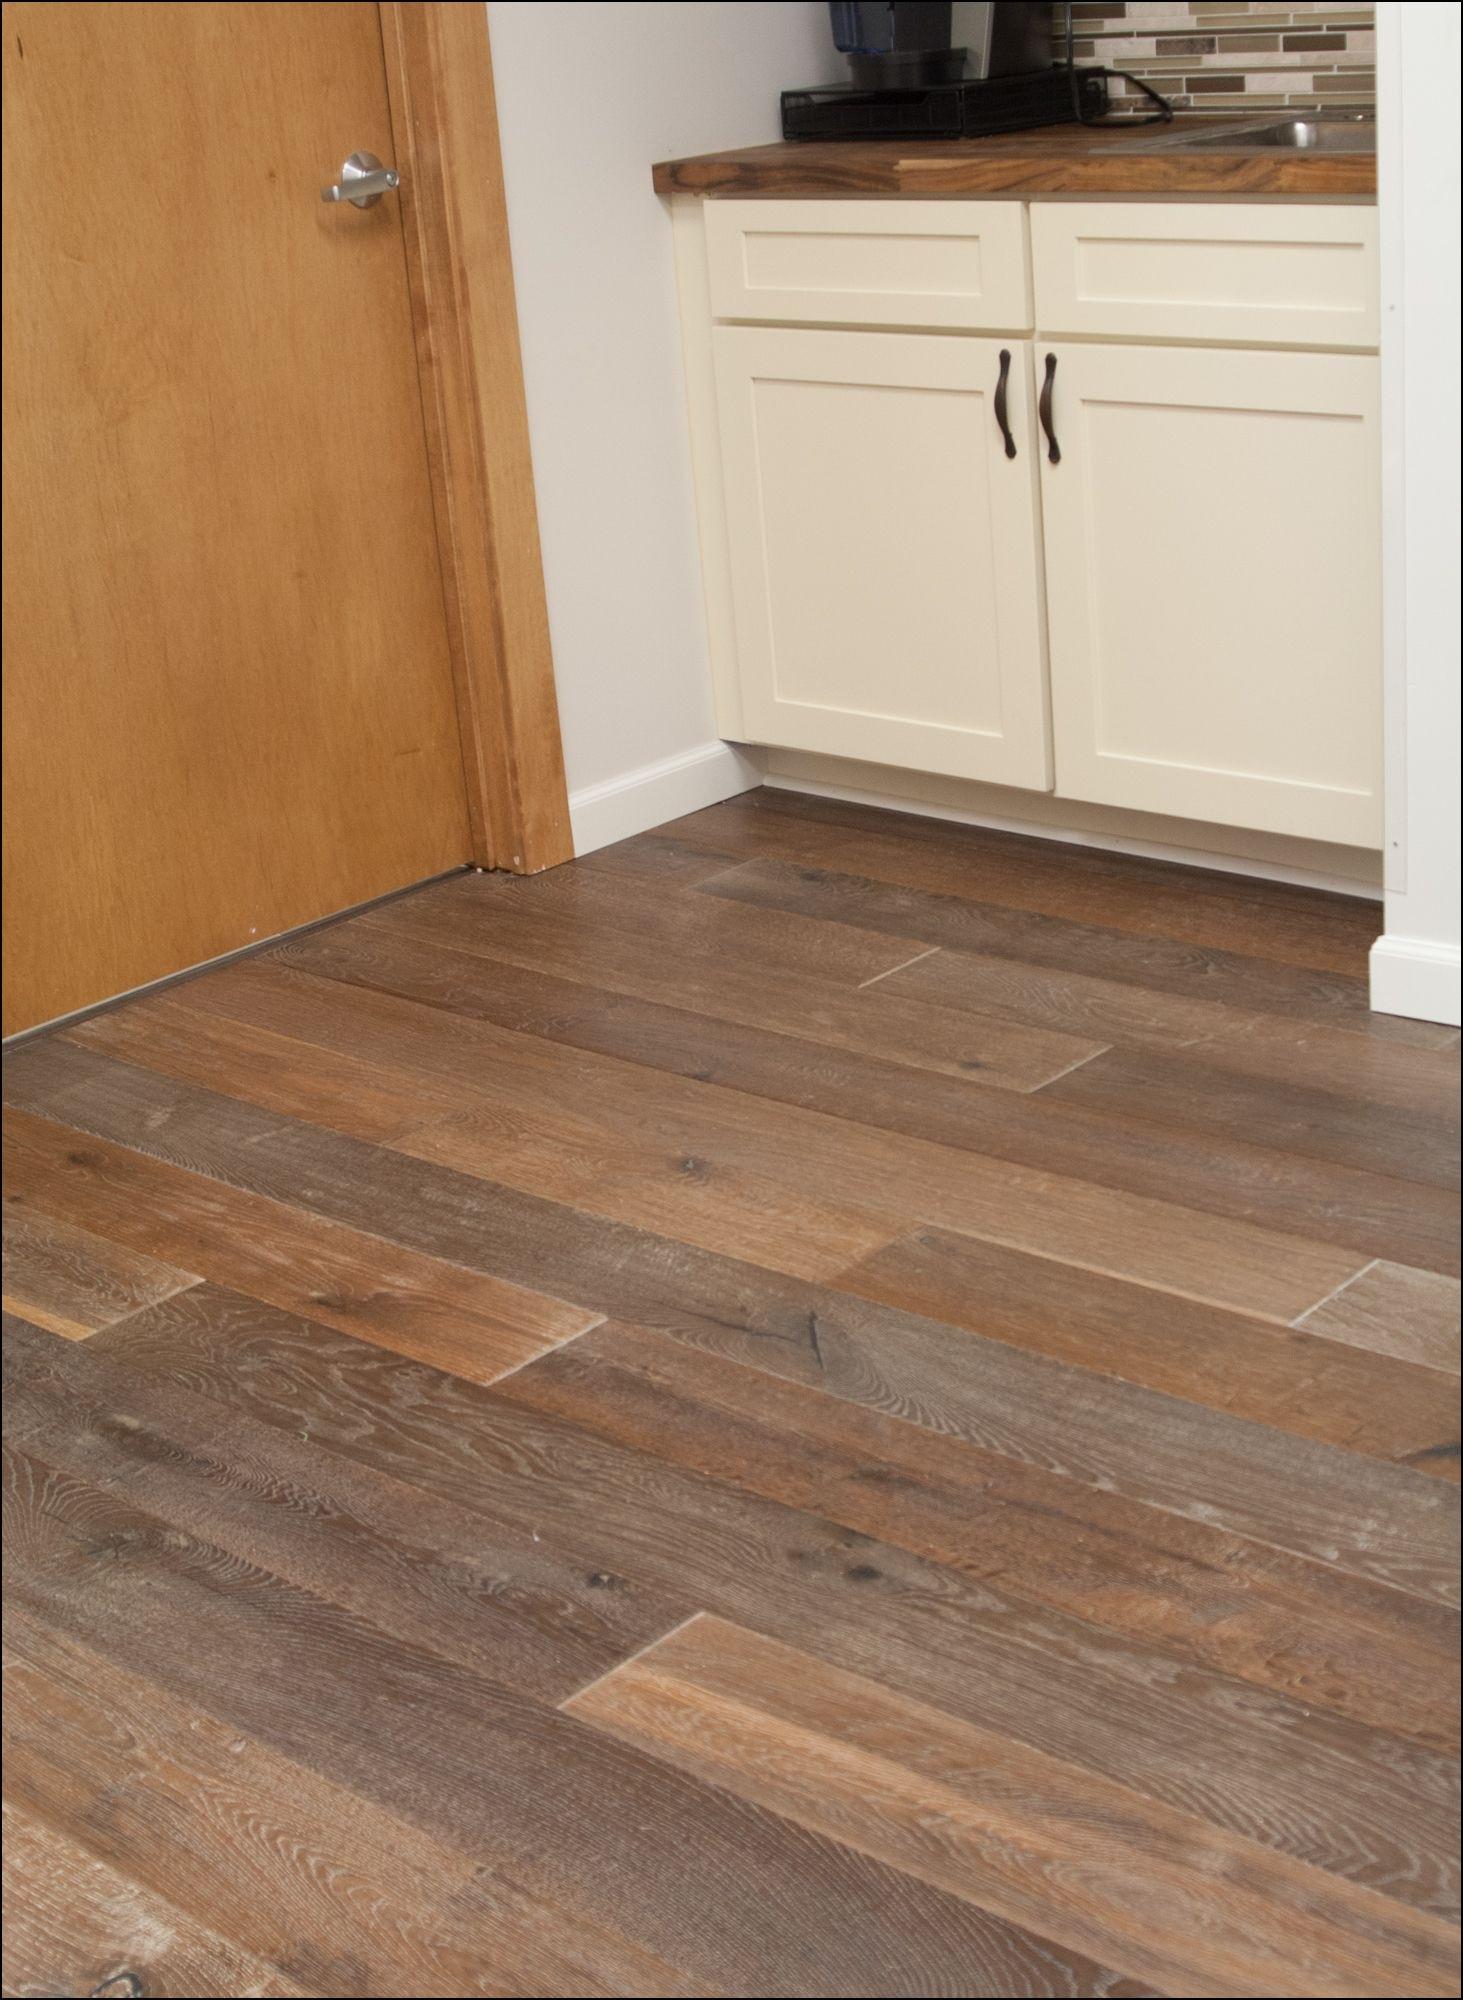 hardwood flooring outlet toronto of hardwood flooring suppliers france flooring ideas regarding hardwood flooring pictures in homes stock vintage white oak costa hardwood floor home ideas of hardwood